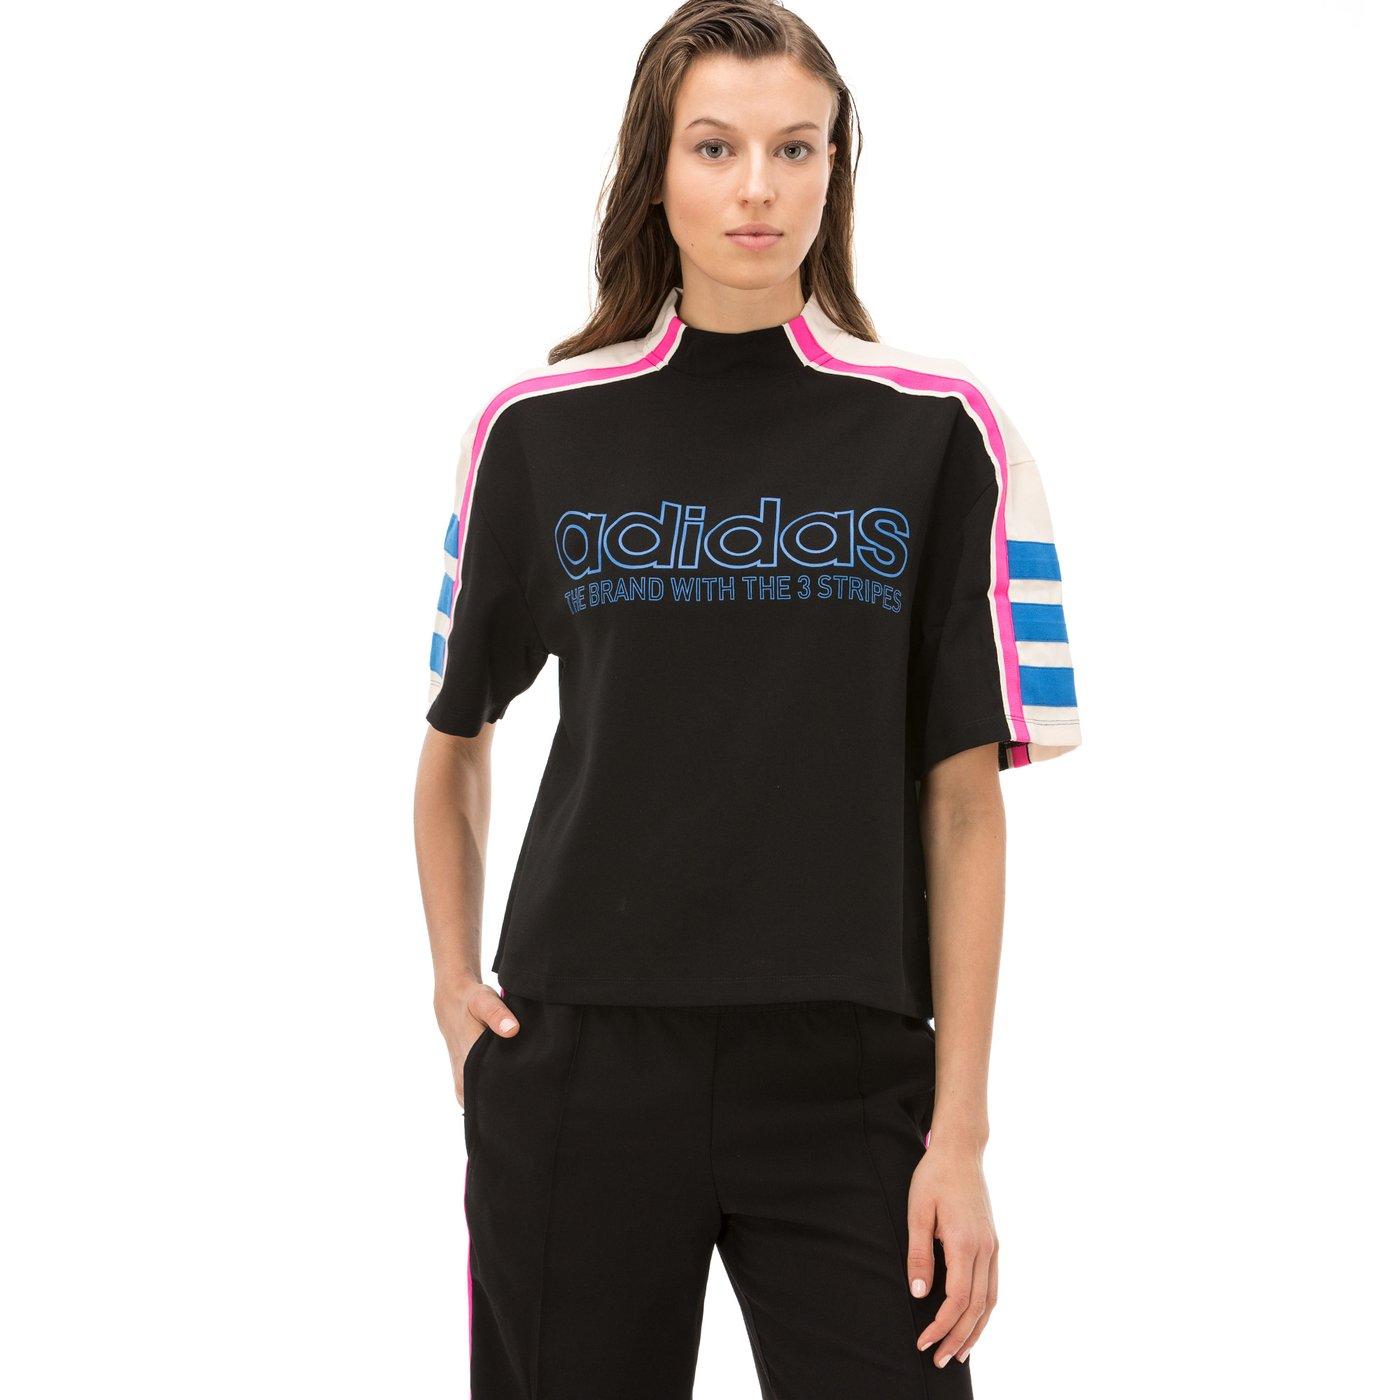 adidas Kadın Siyah T-Shirt